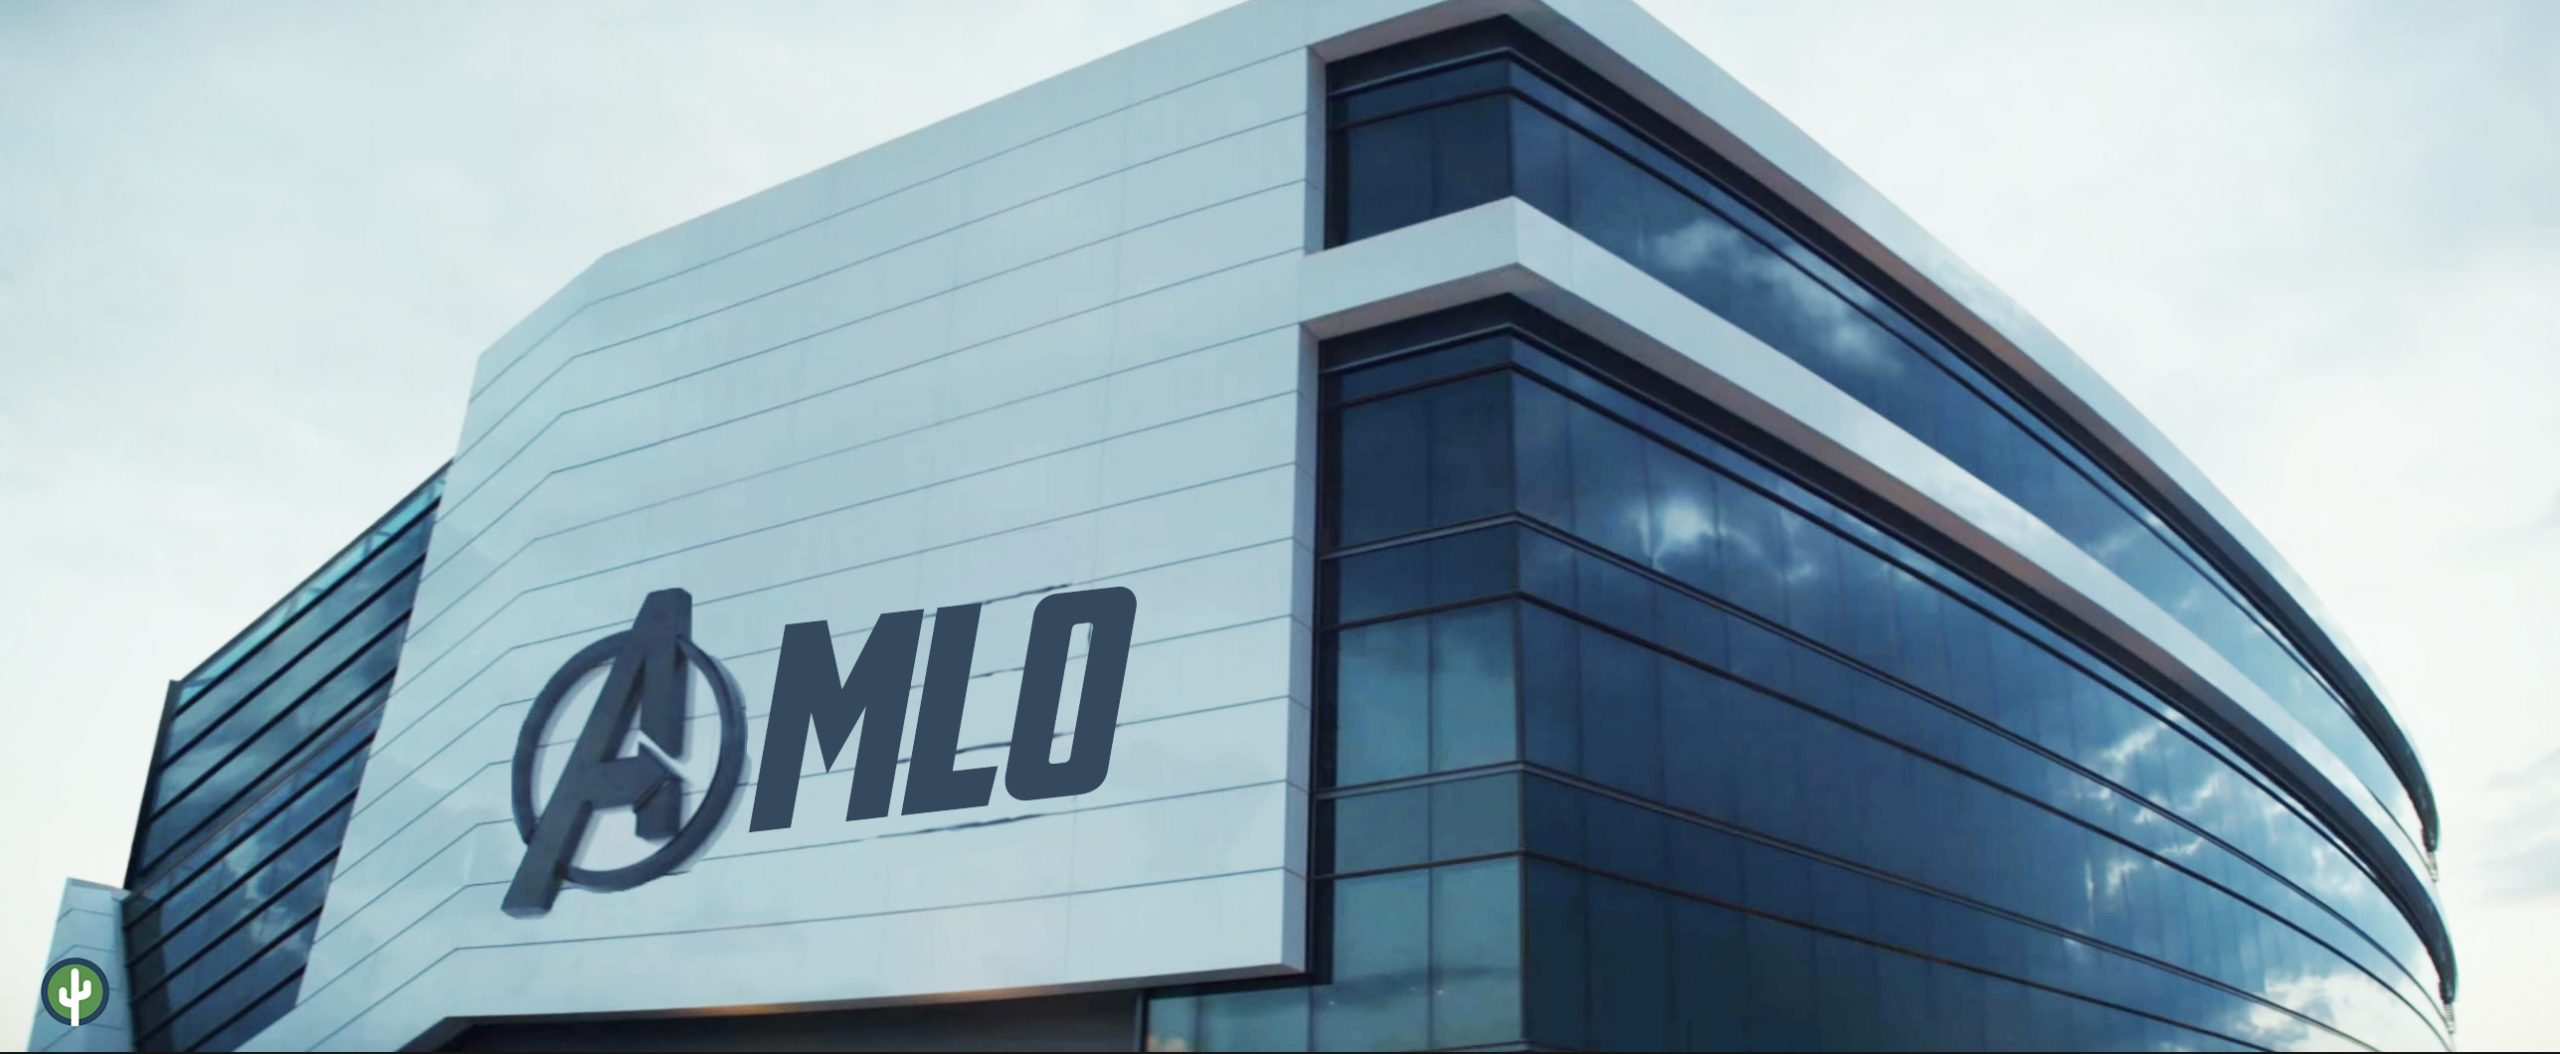 AMLO Avengers HQ